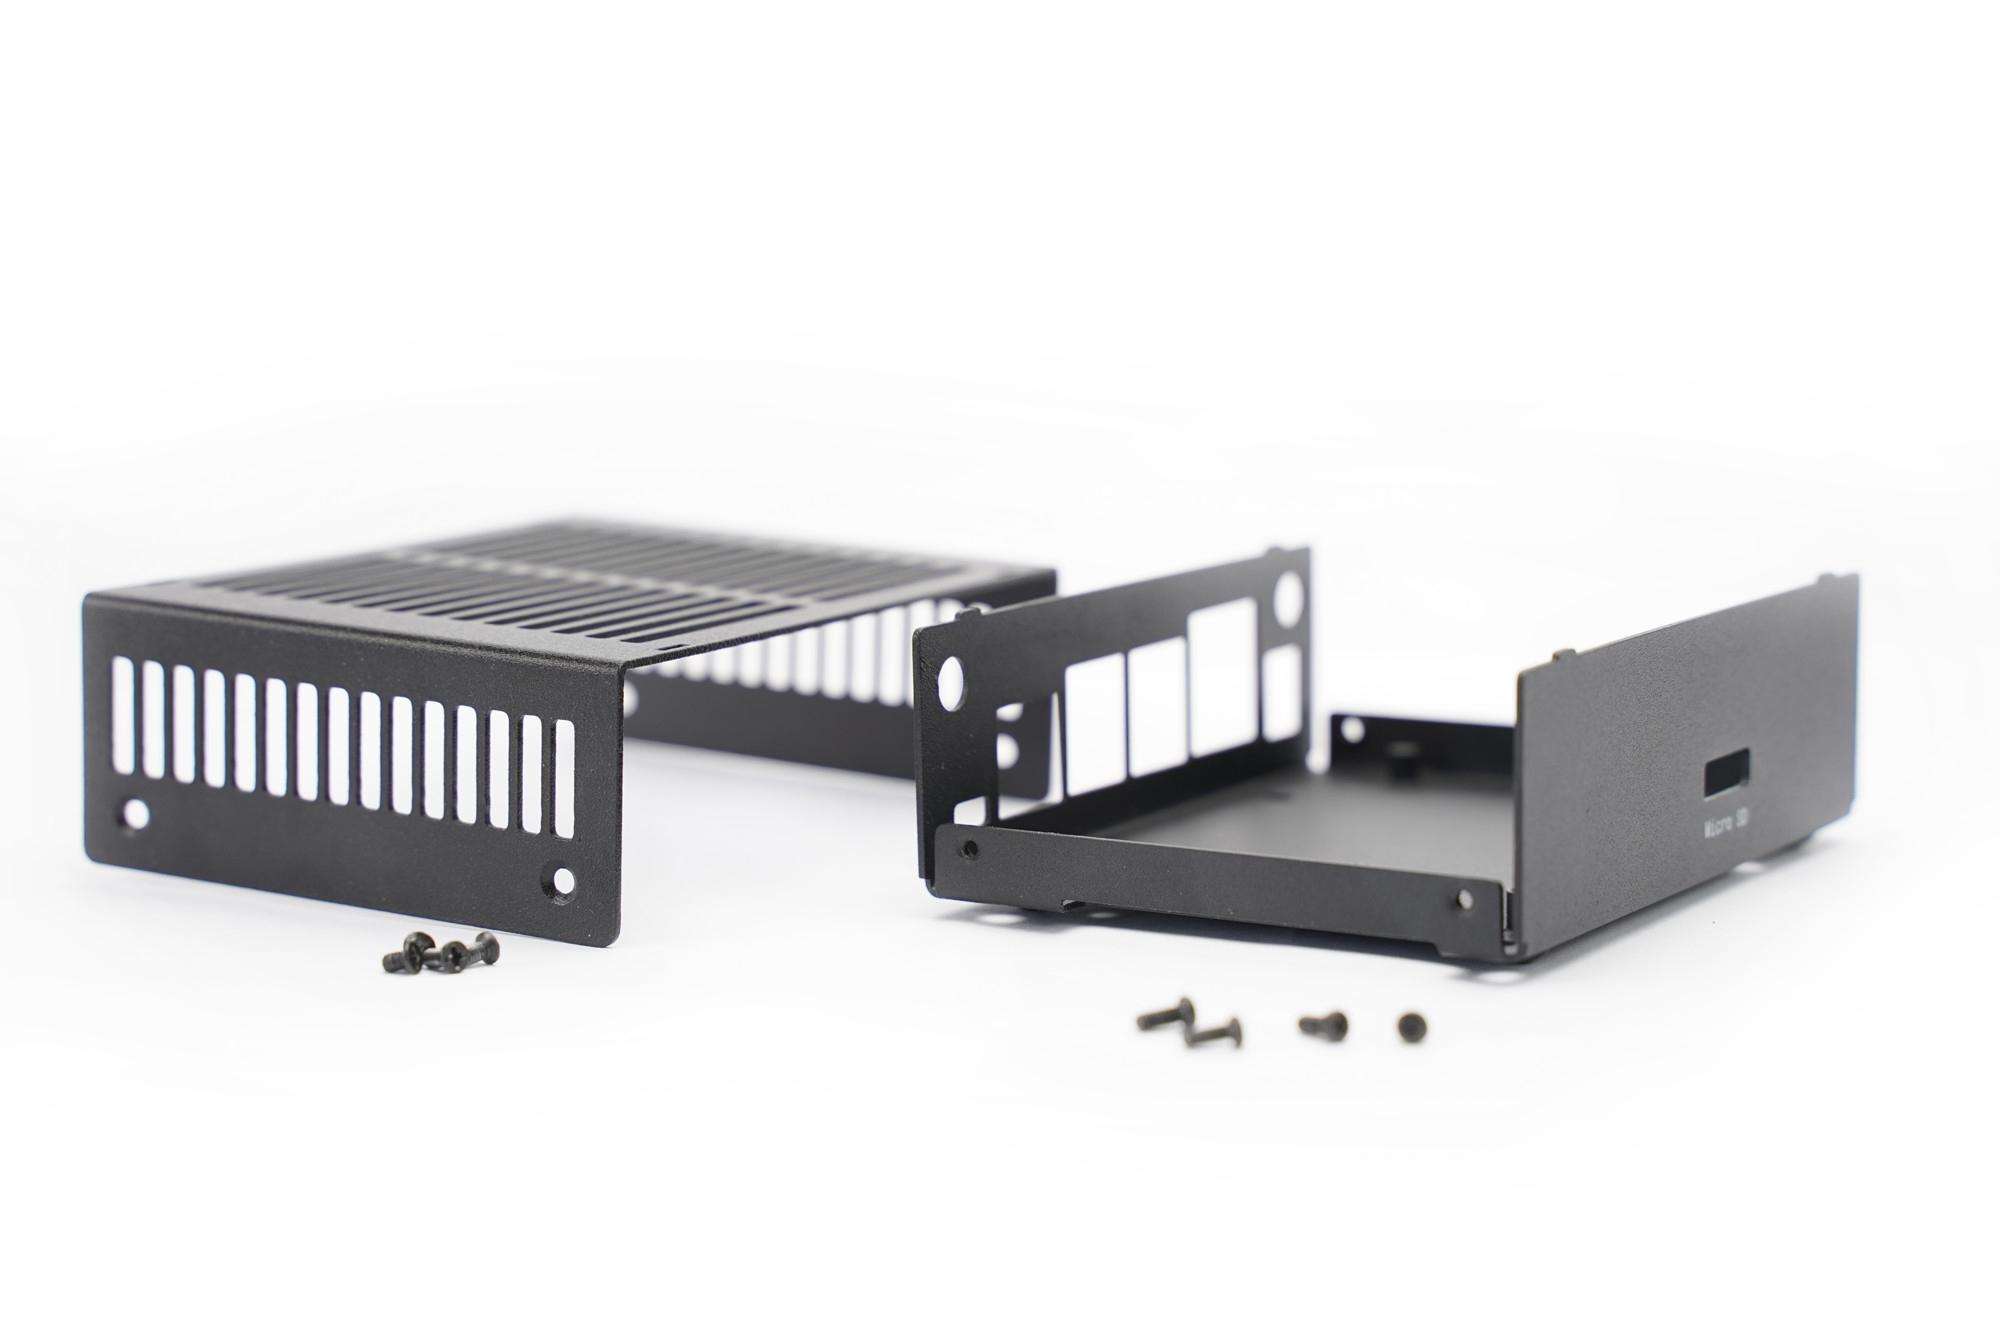 KKSB Jetson Nano Case Compact